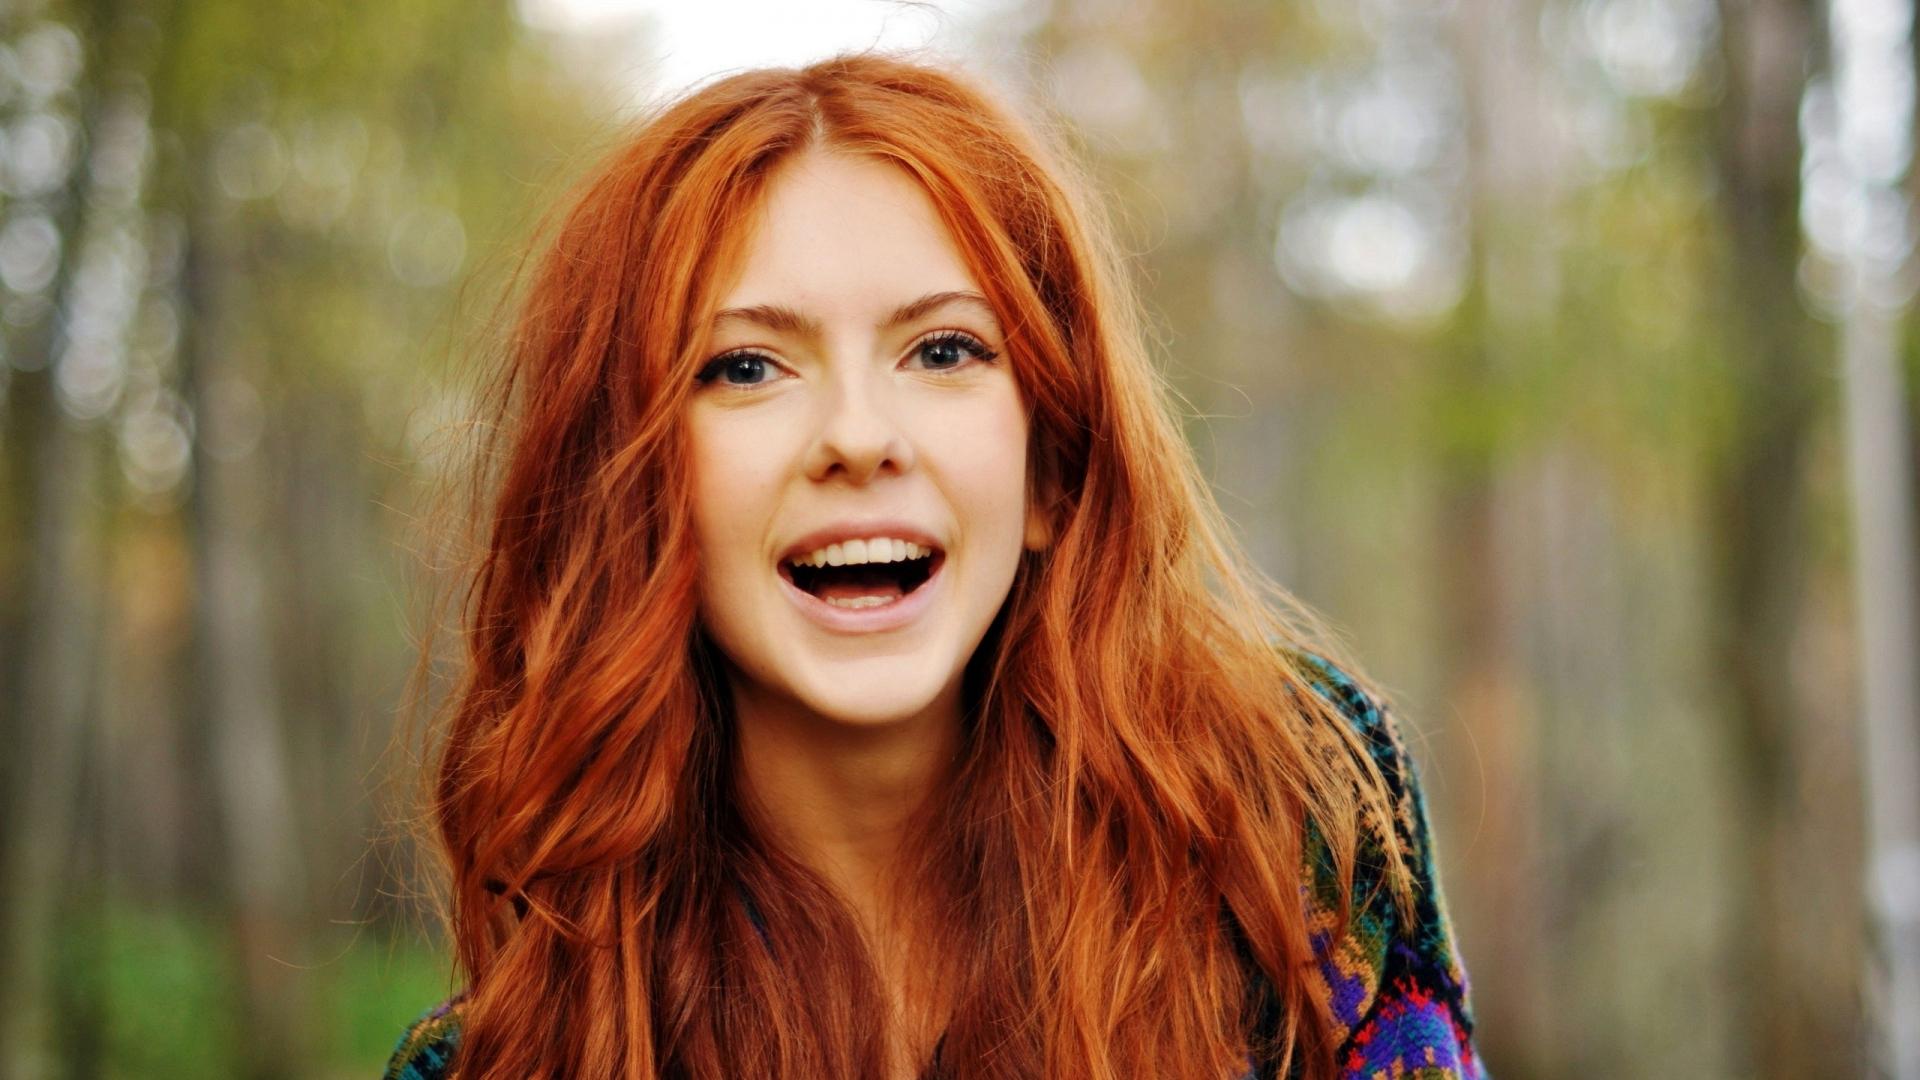 redhead_girl_laugh_nice_funny_humor_55186_1920x1080